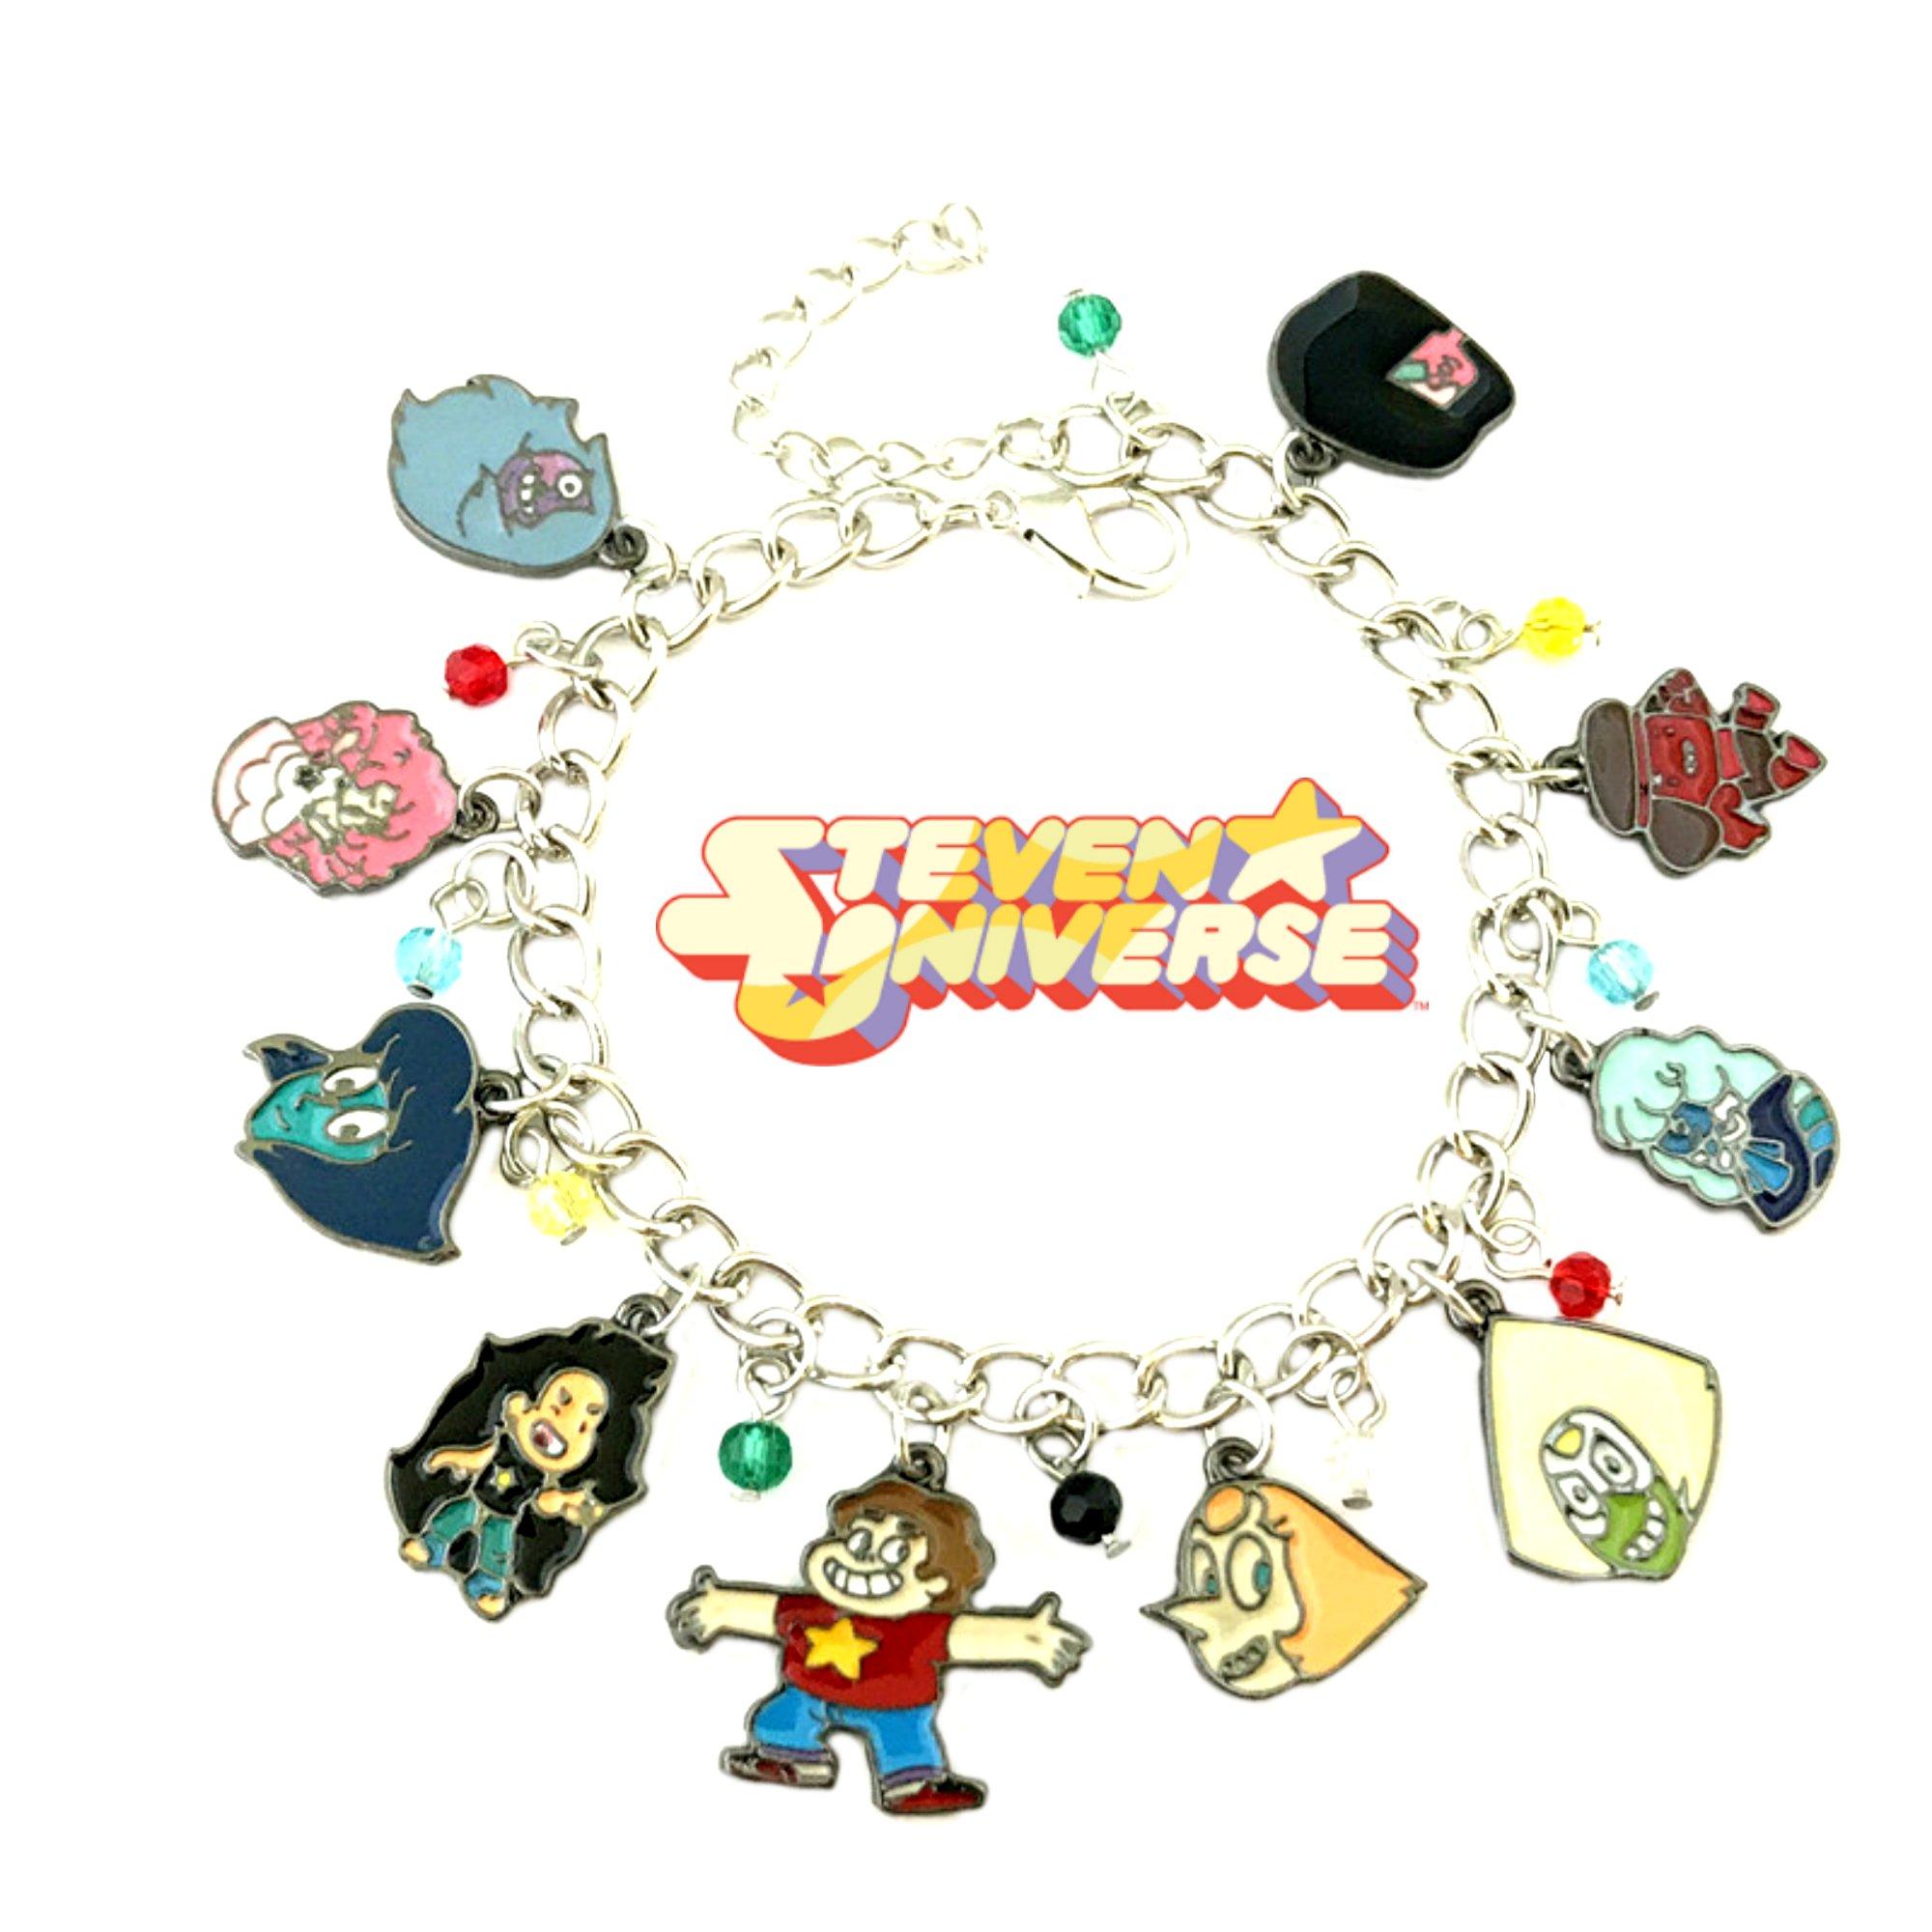 Superheroes Brand Stevens Universe Cartoon Charm Bracelet w/Gift Box Movies Premium Quality Cosplay Jewelry Series